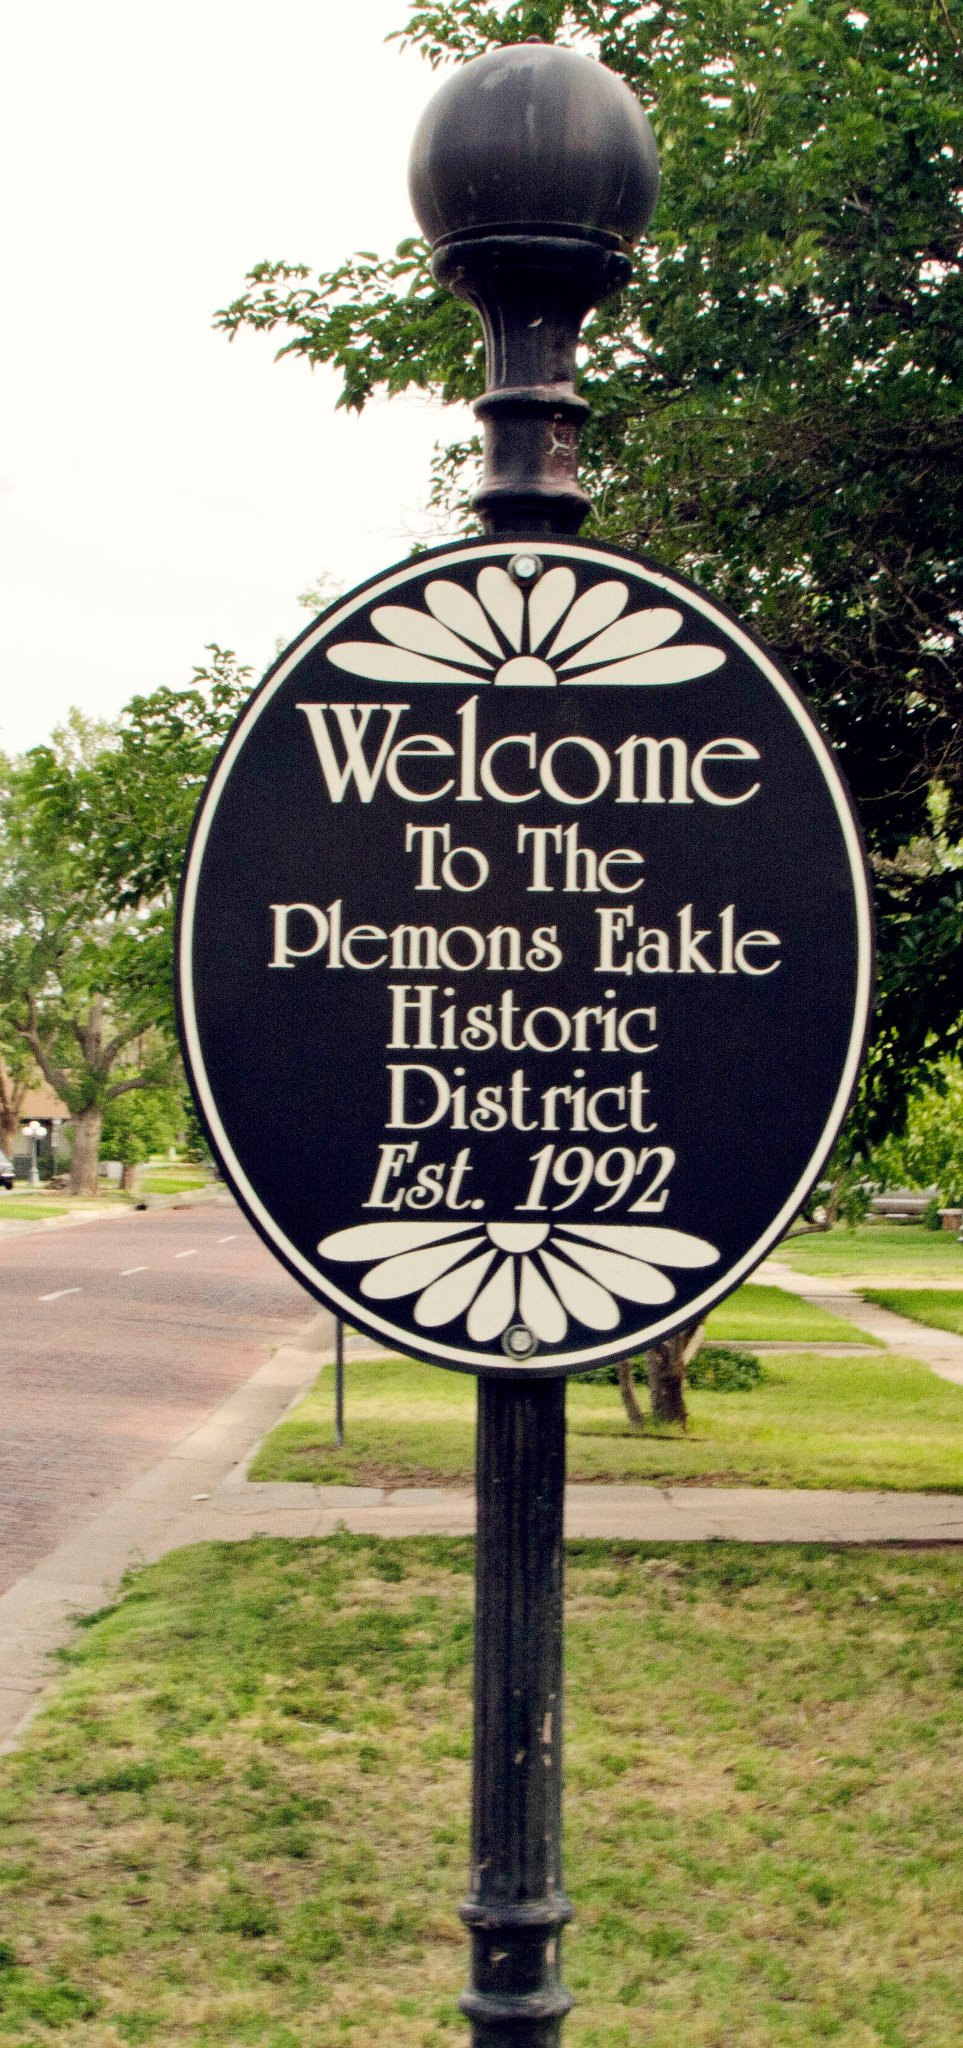 Plemons-Eakle Historic District Marker